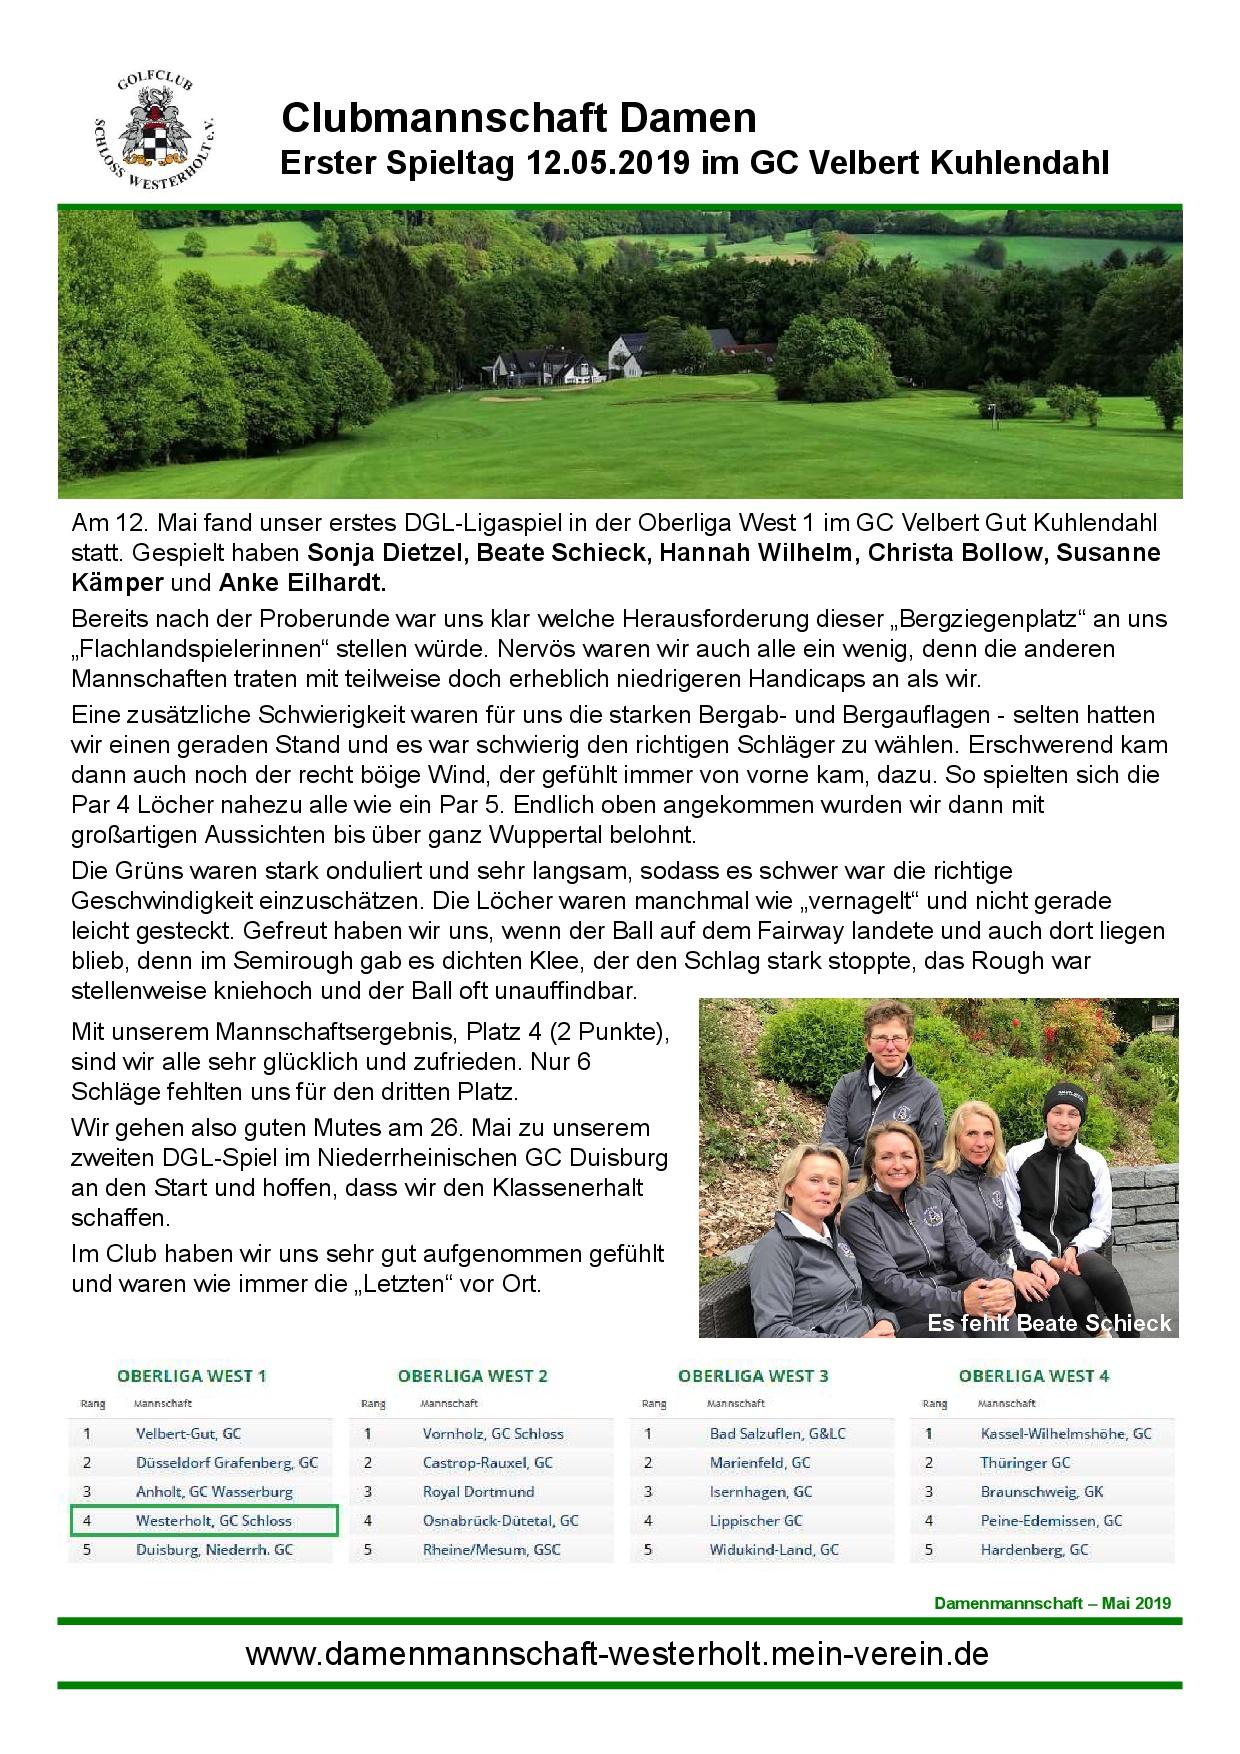 2019 DGL 05-12 Velbert Kuhlendahl Spielbericht.jpg